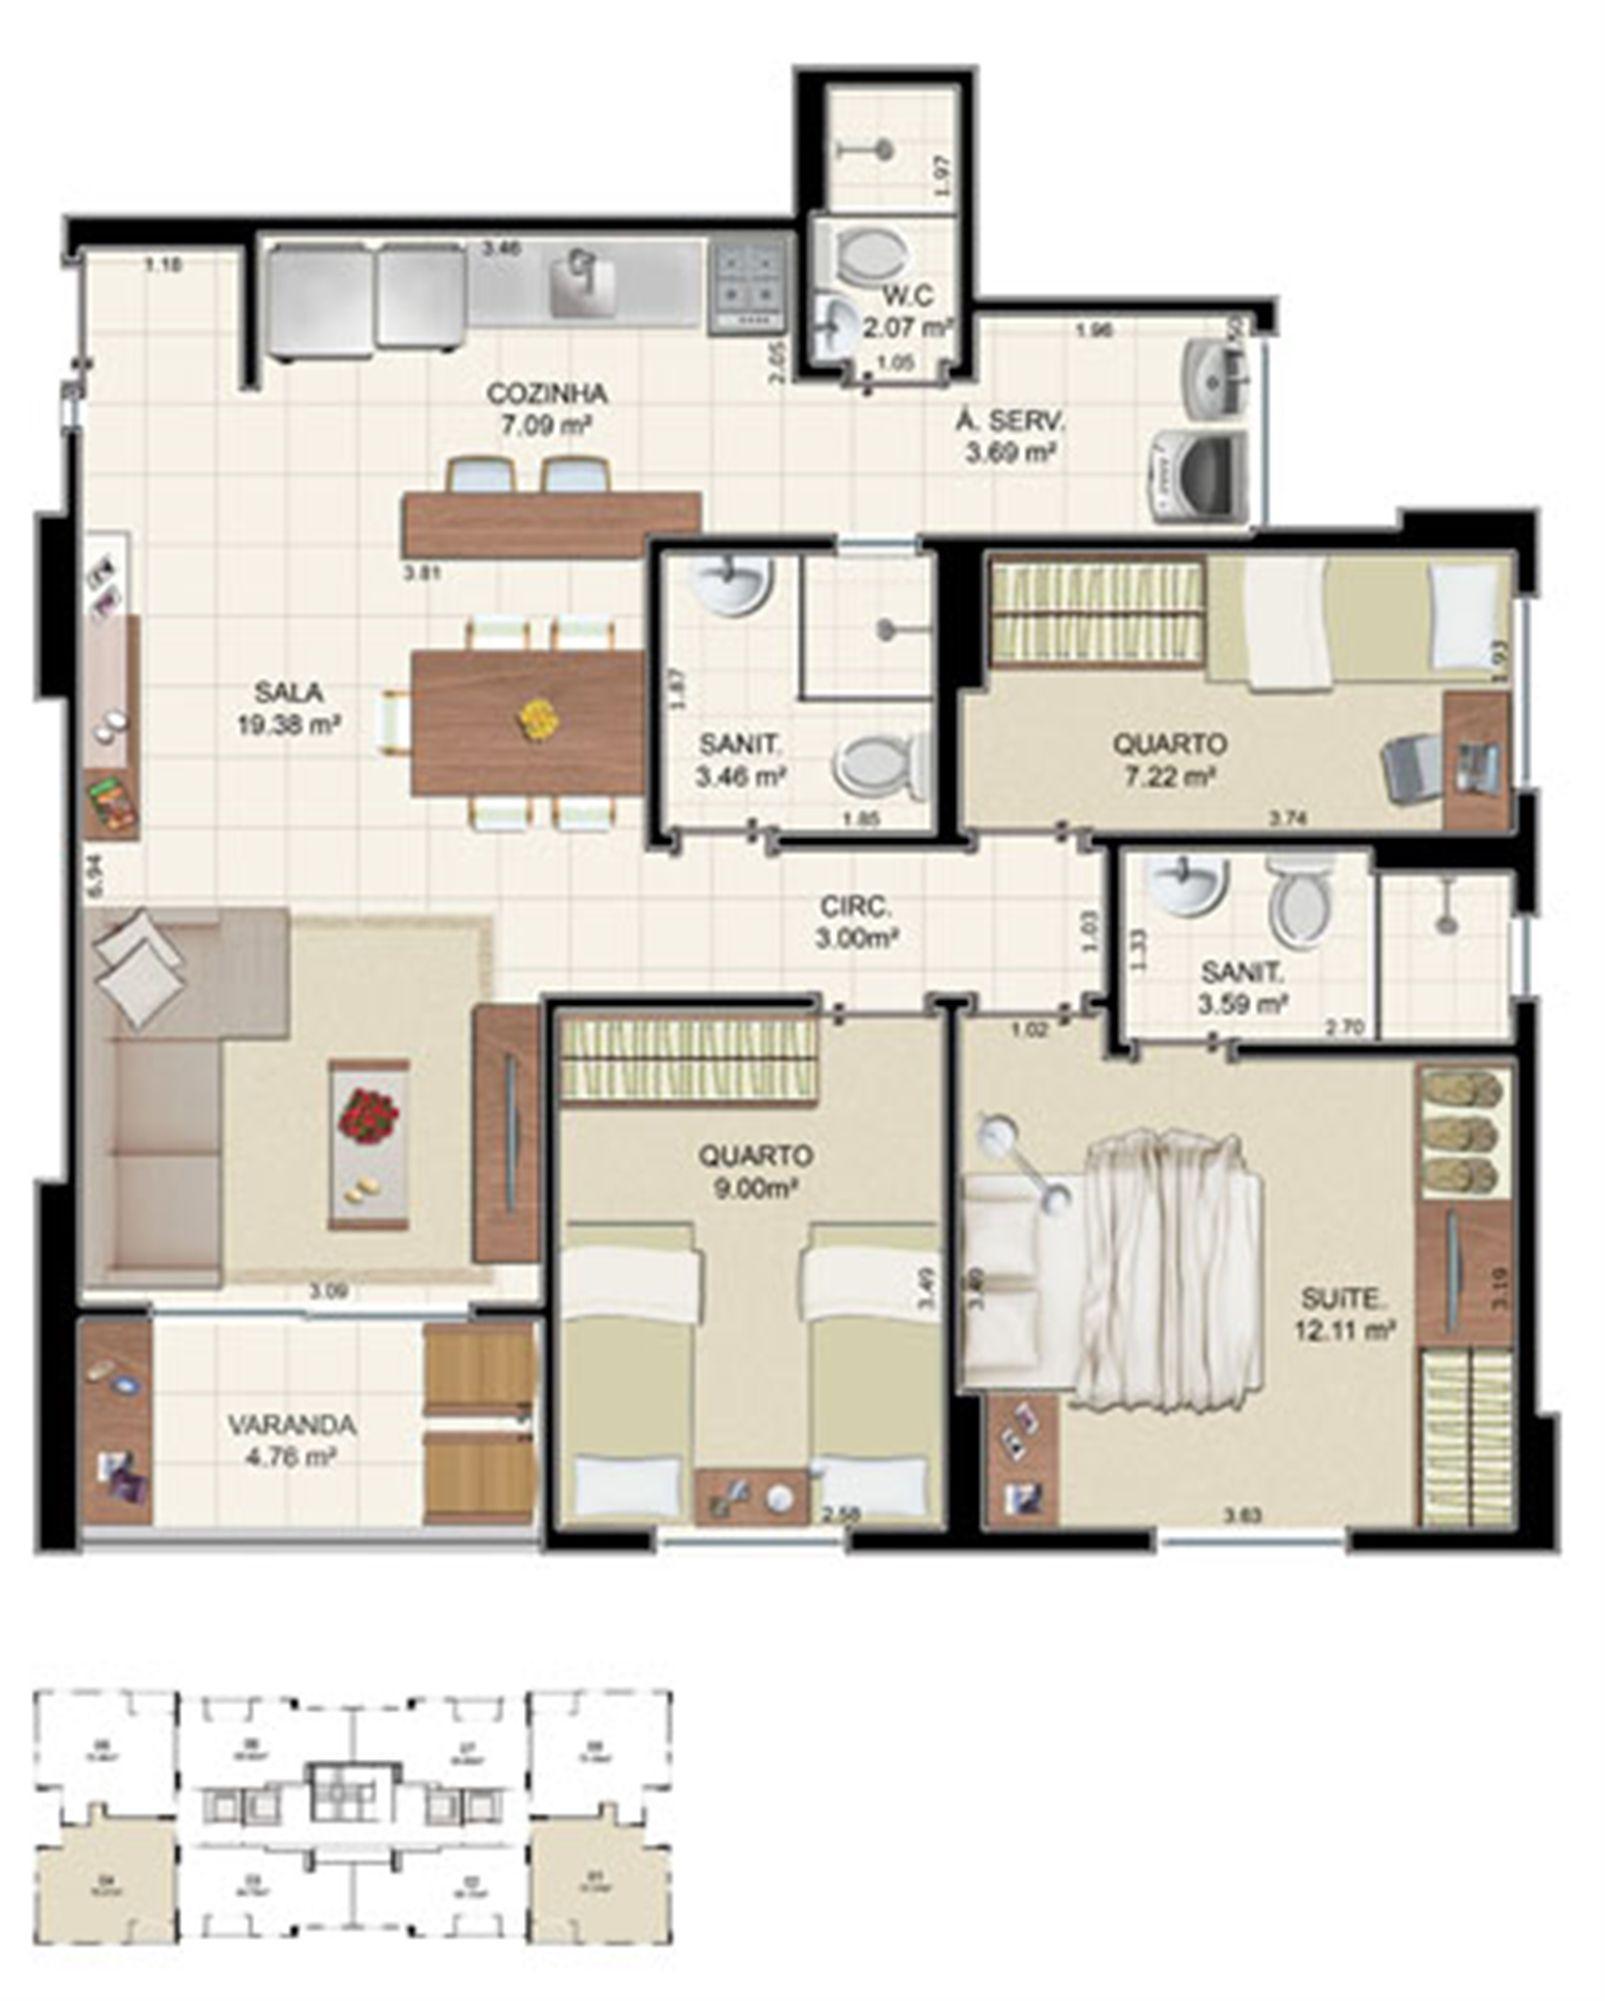 Planta Tipo 3 quartos - 75,37 m² | Morada Alto do Imbuí – Apartamentono  Alto do Imbuí - Salvador - Bahia